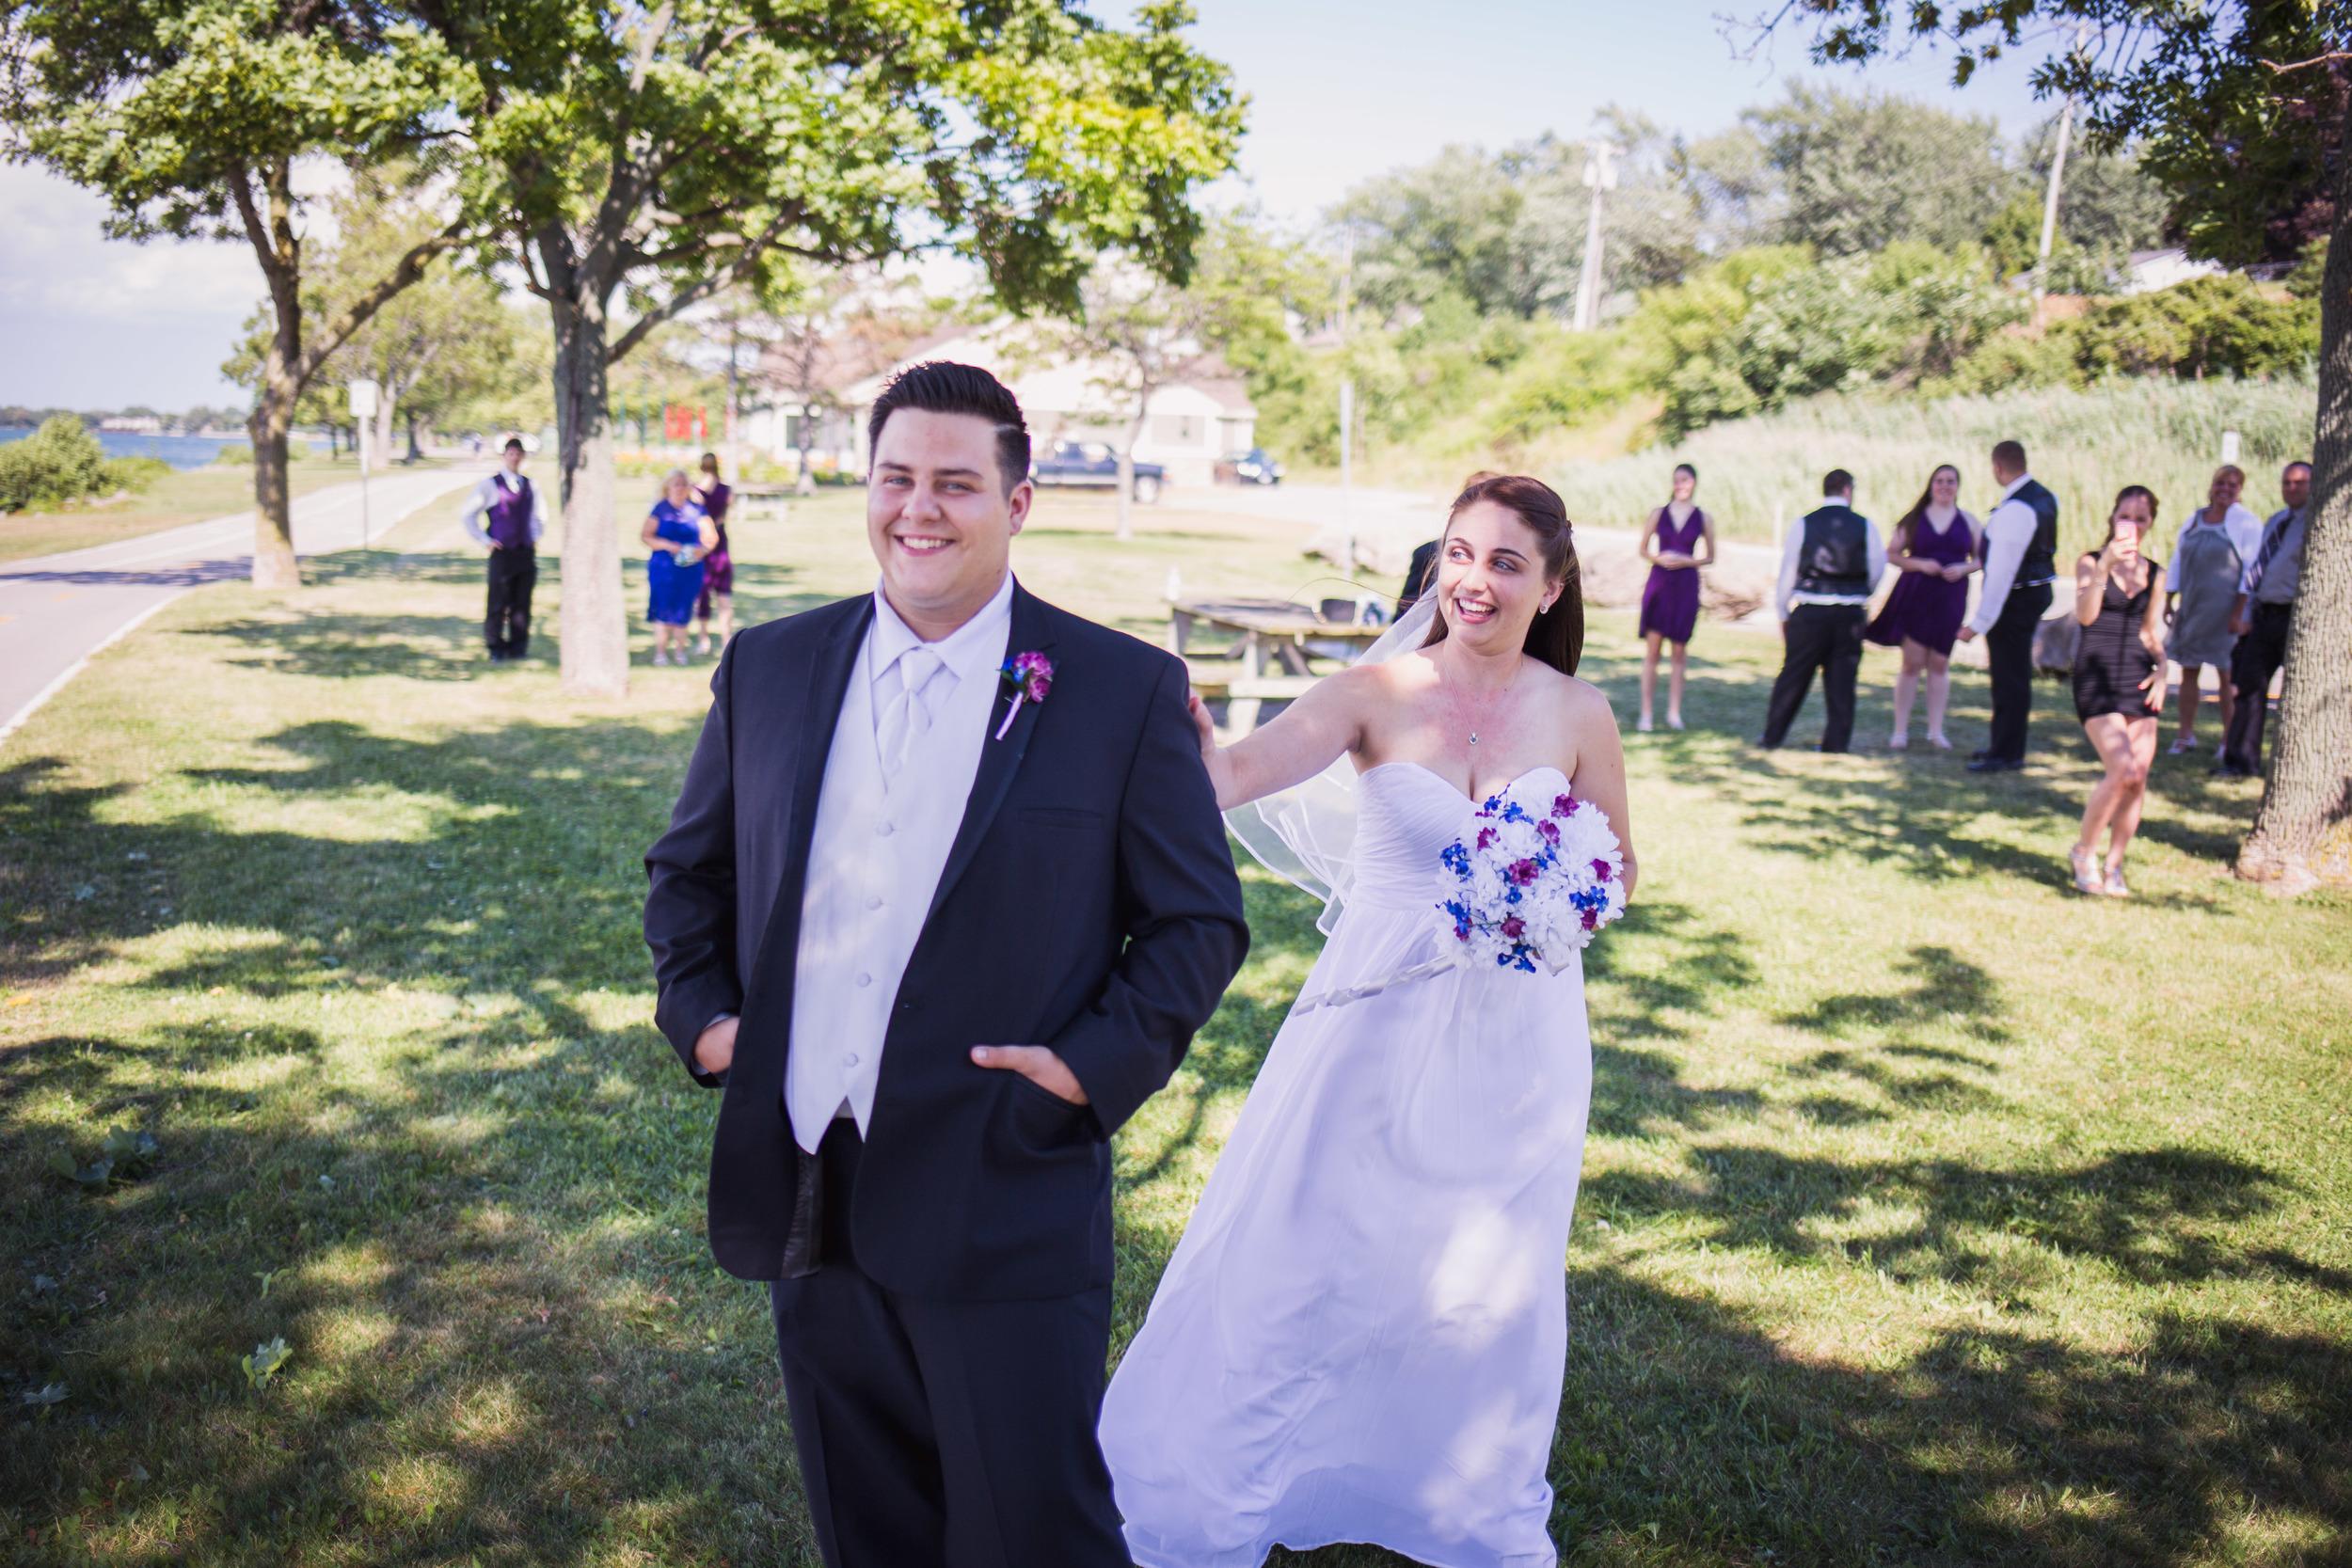 Stephanie-and-Mitchell-Buffalo-NY-Wedding-Stefan-Ludwig-Photography-6.jpg